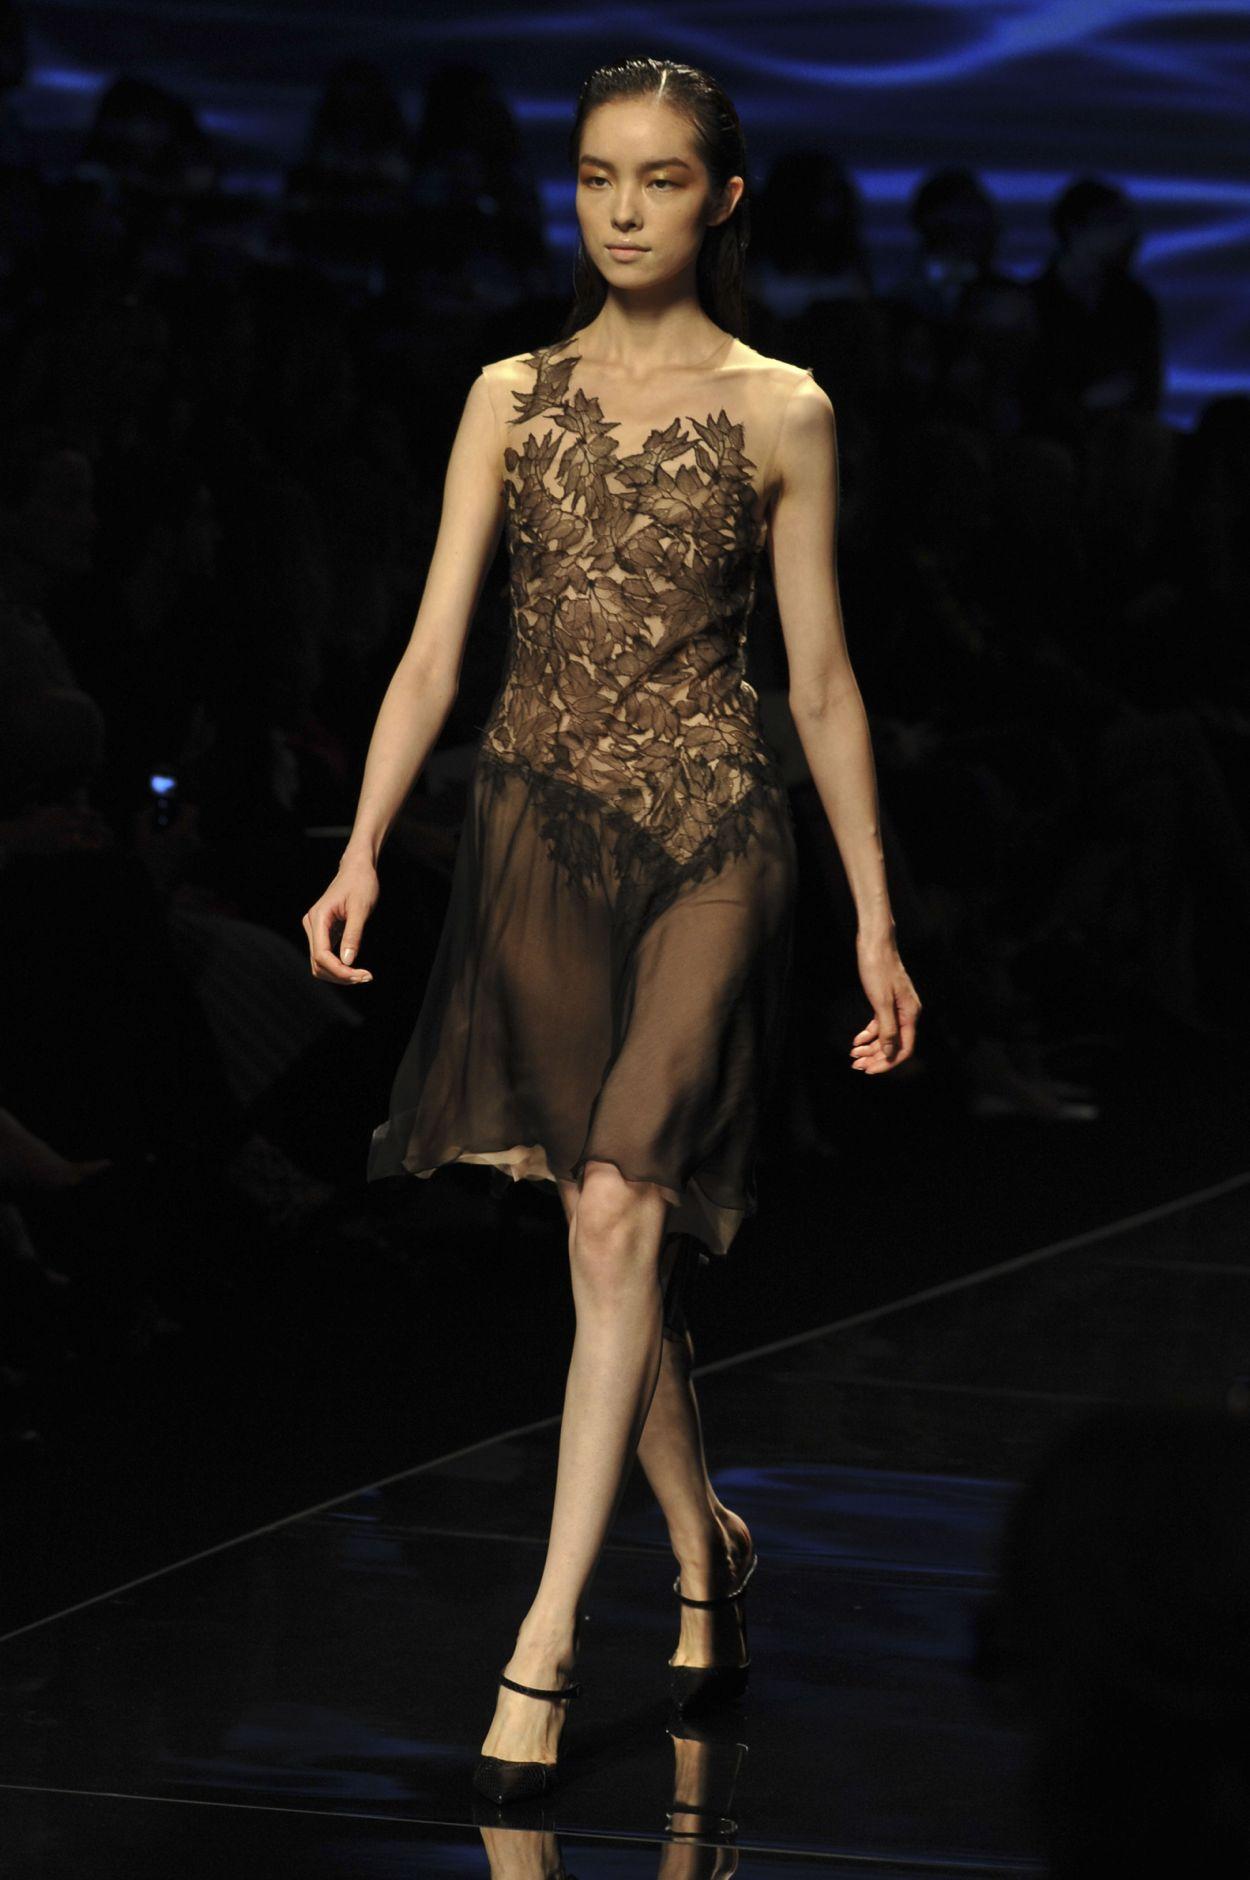 Catwalk Alberta Ferretti Spring Summer 2013 Women Collection Milano Fashion Week